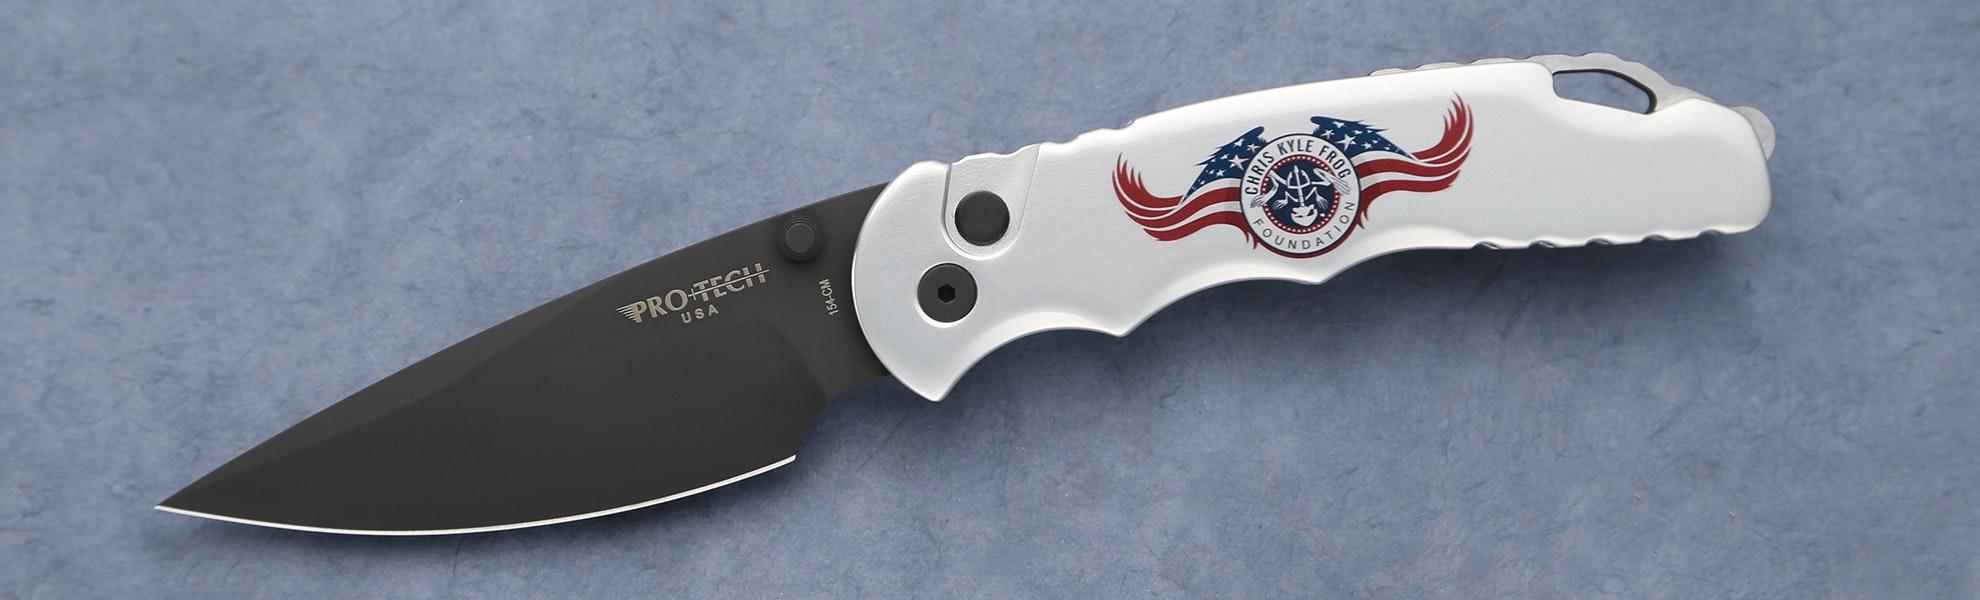 ProTech Knives TR-4 Chris Kyle Foundation